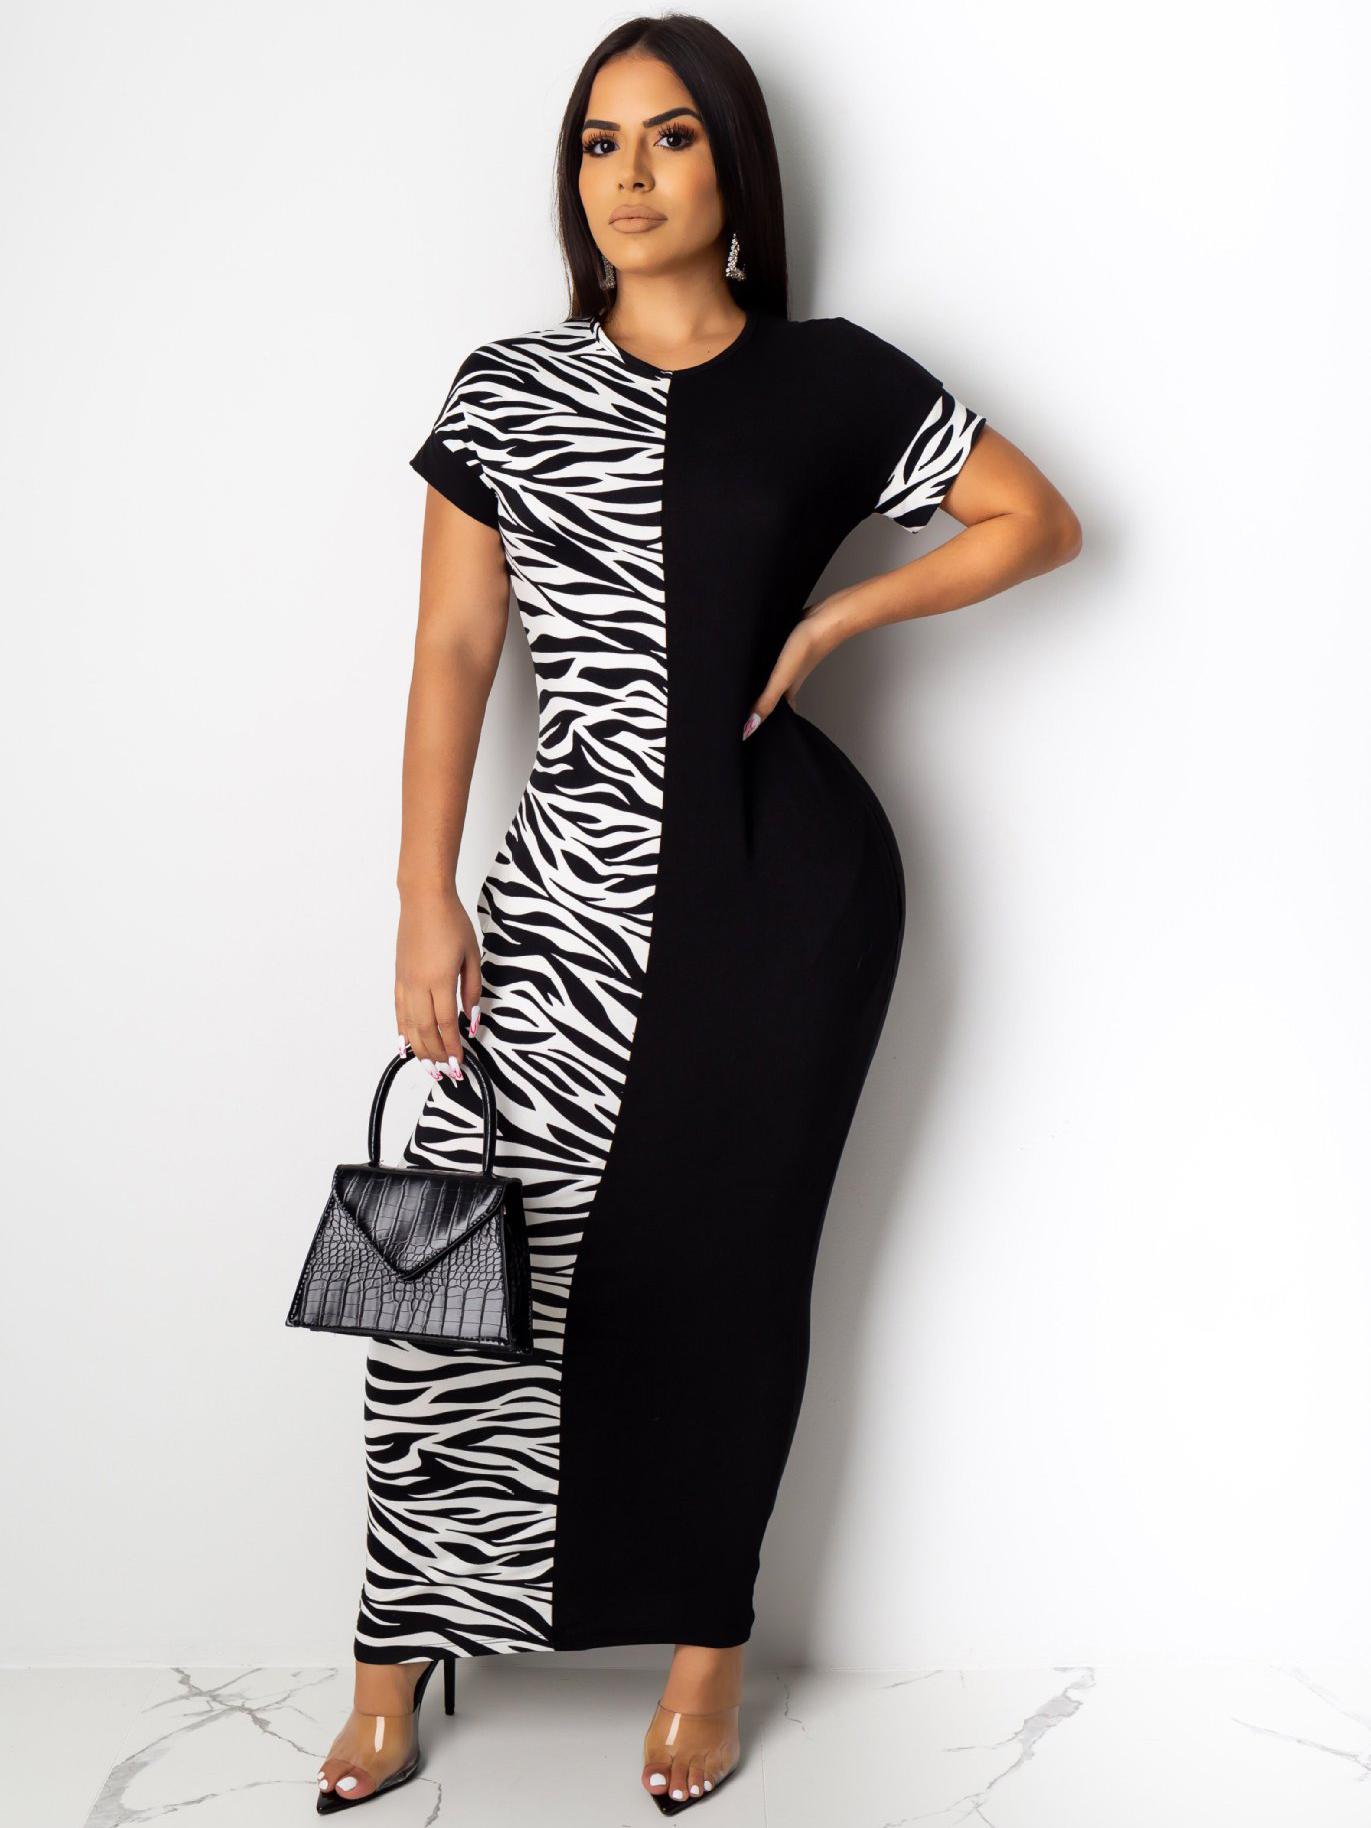 Zebra Printed Contrast Color Short Sleeve Maxi Dress